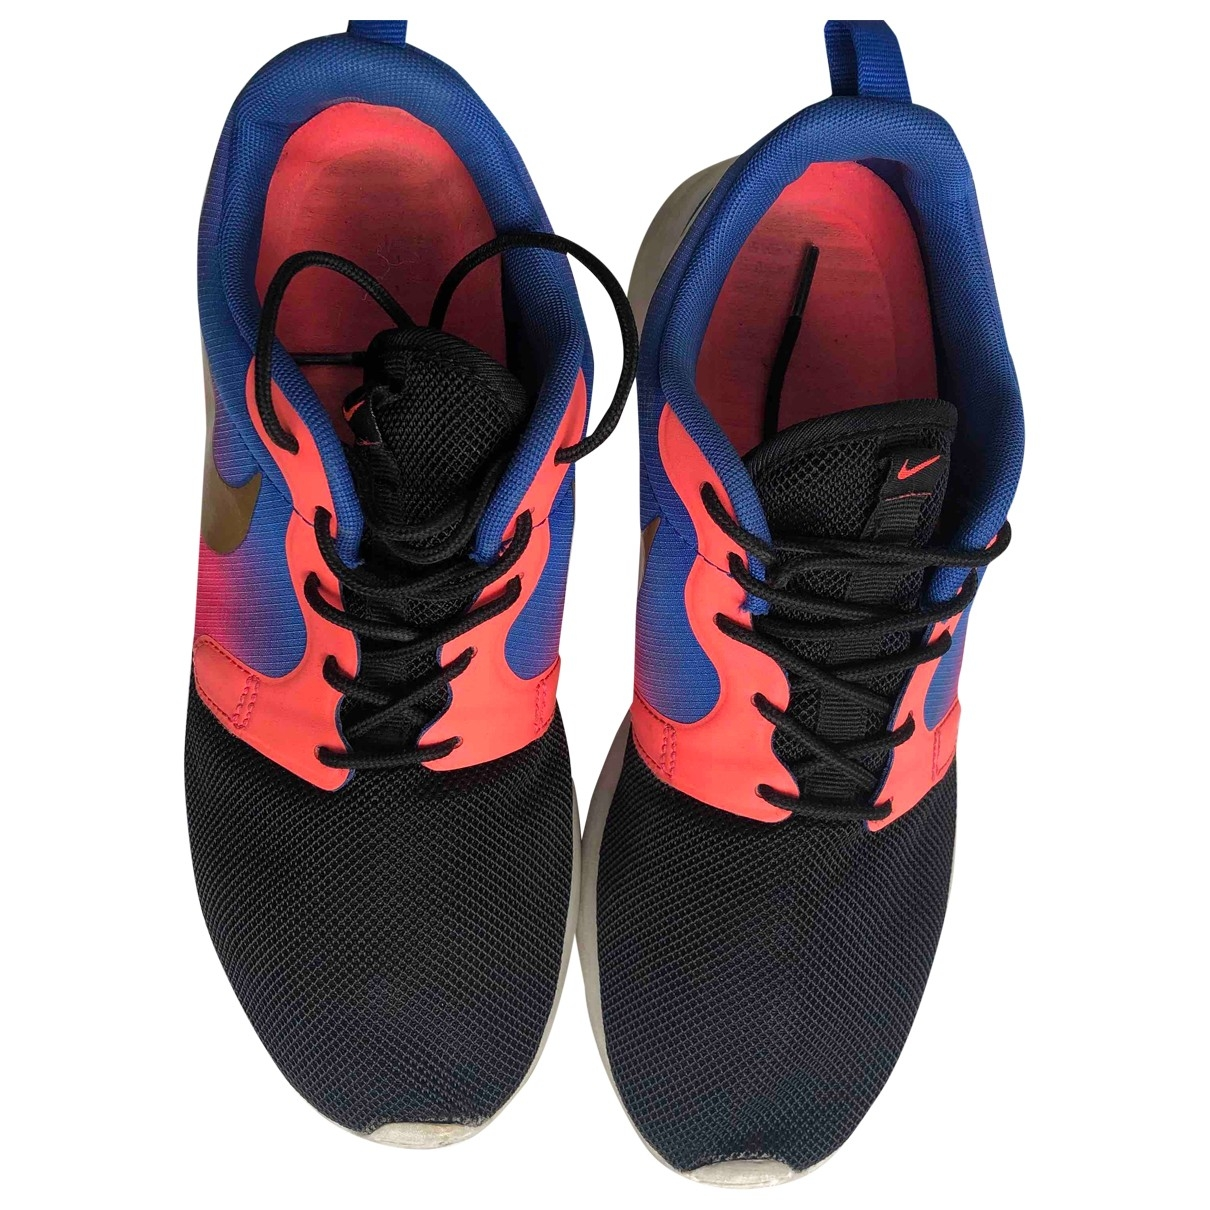 Nike - Baskets Roshe Run pour femme en toile - multicolore